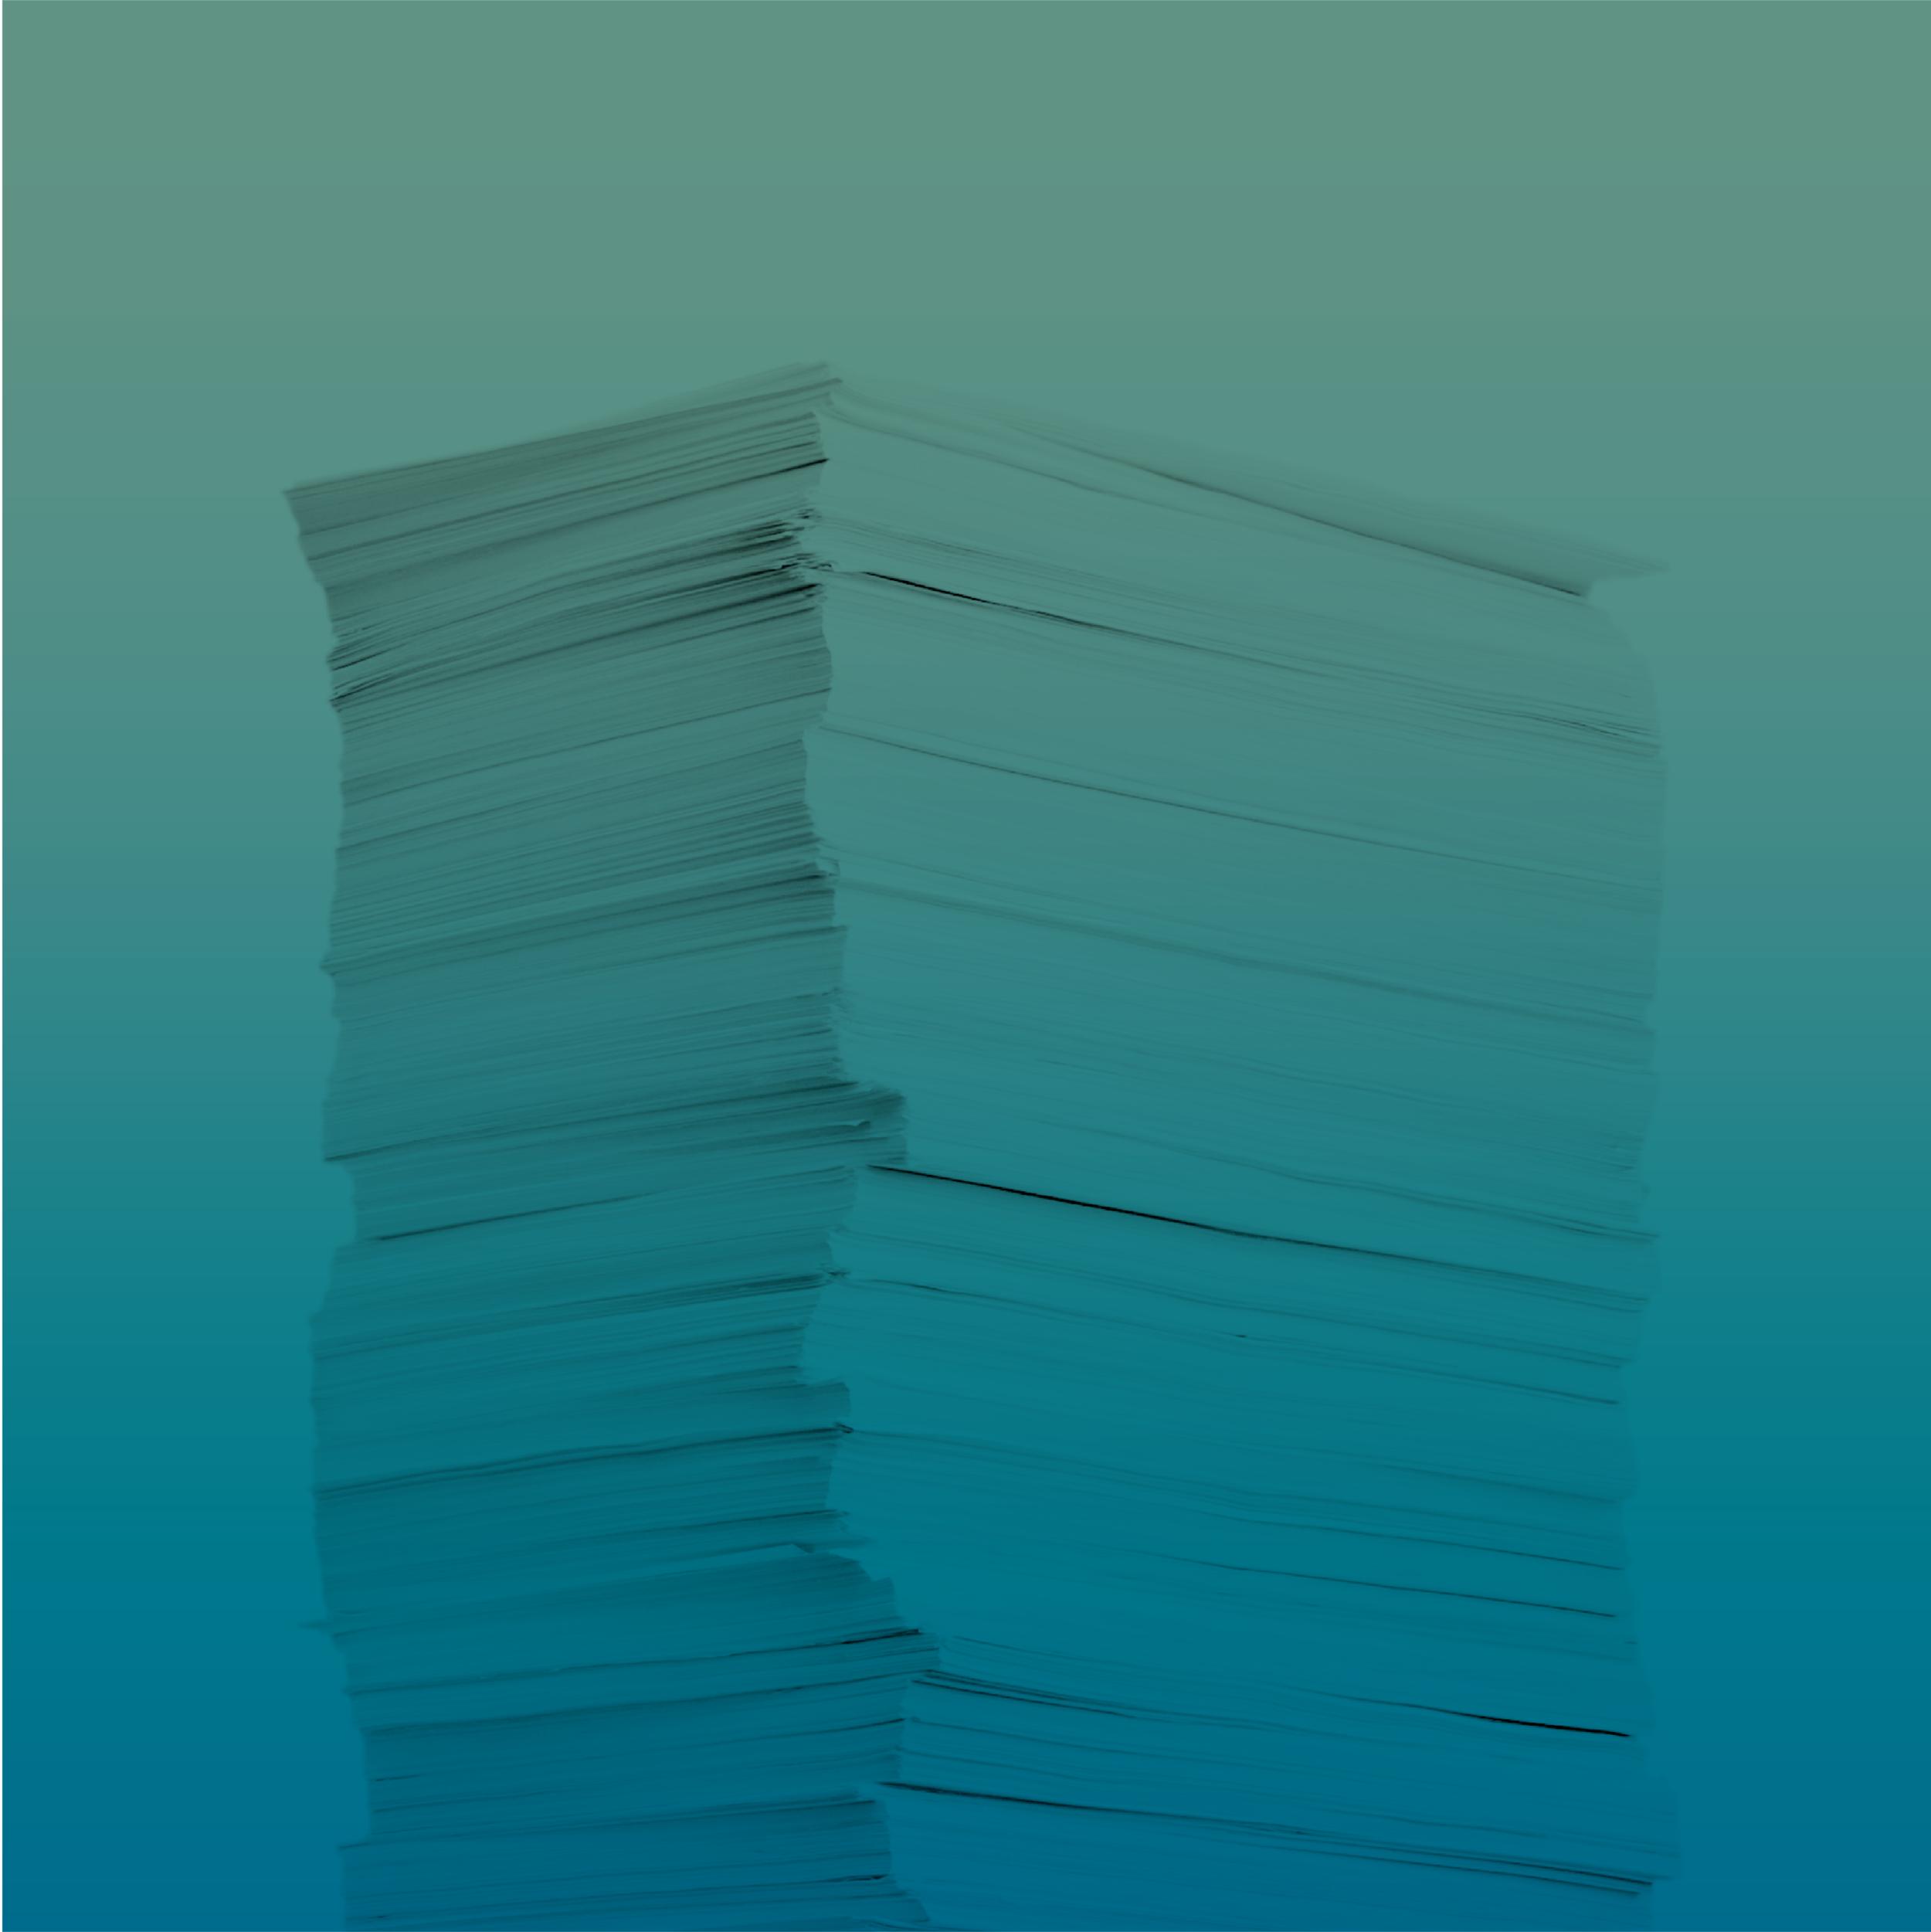 pledge eight - paper